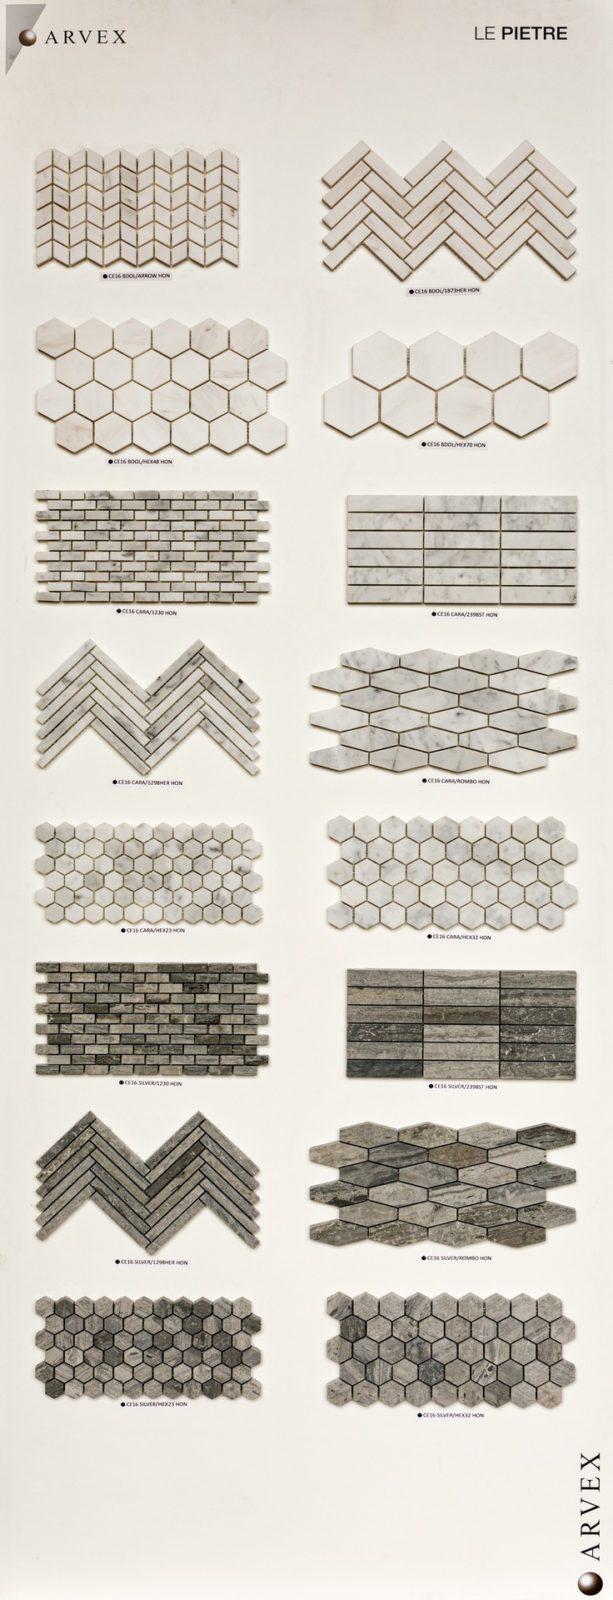 Mosaico - Le Pietre 05